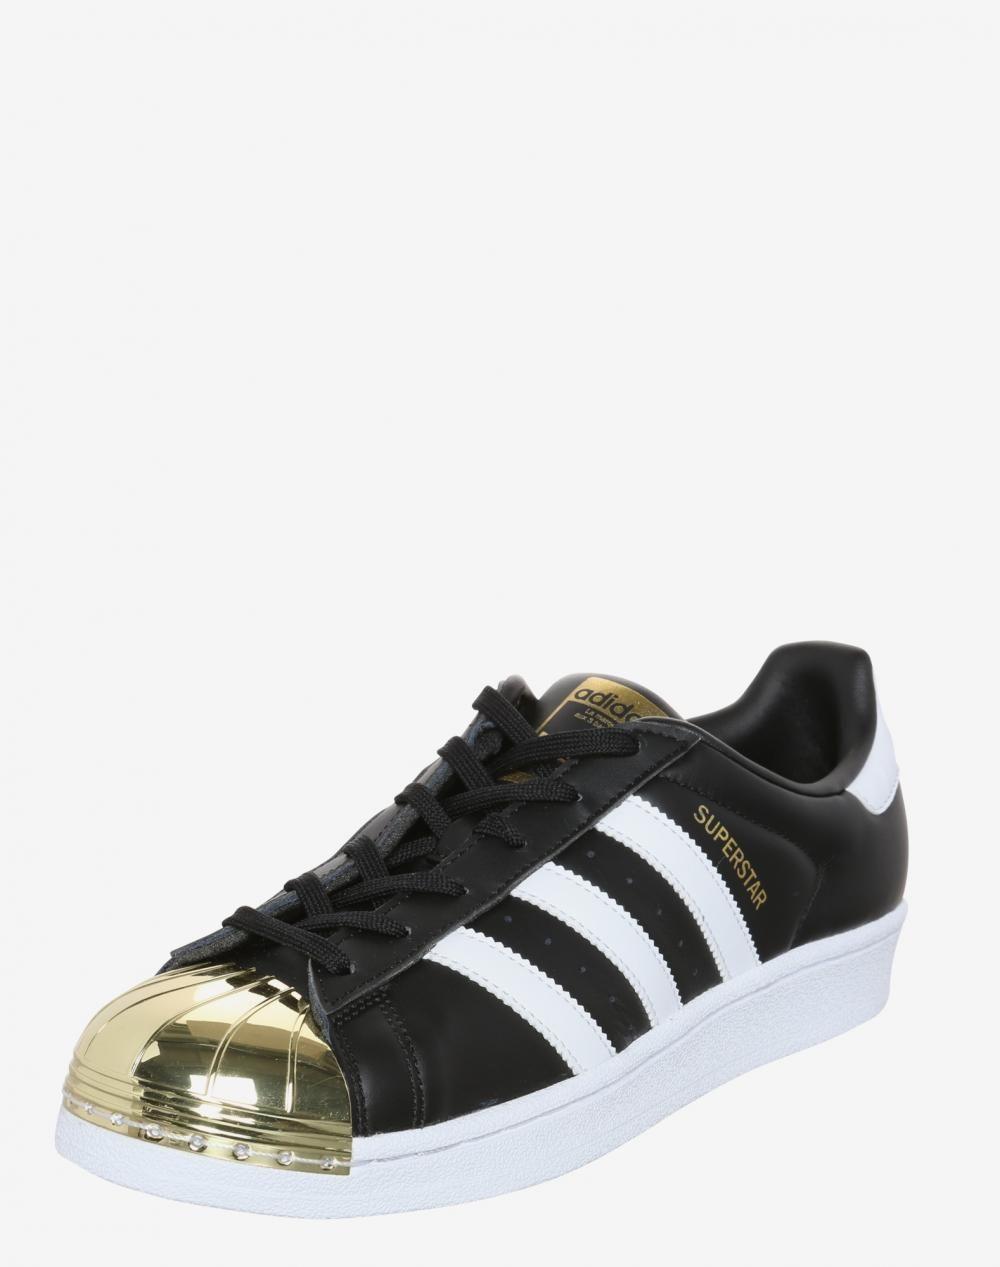 on sale 53ec2 6eba6 Adidas Superstar Damen Sneaker Gold / Schwarz / Weiß ...